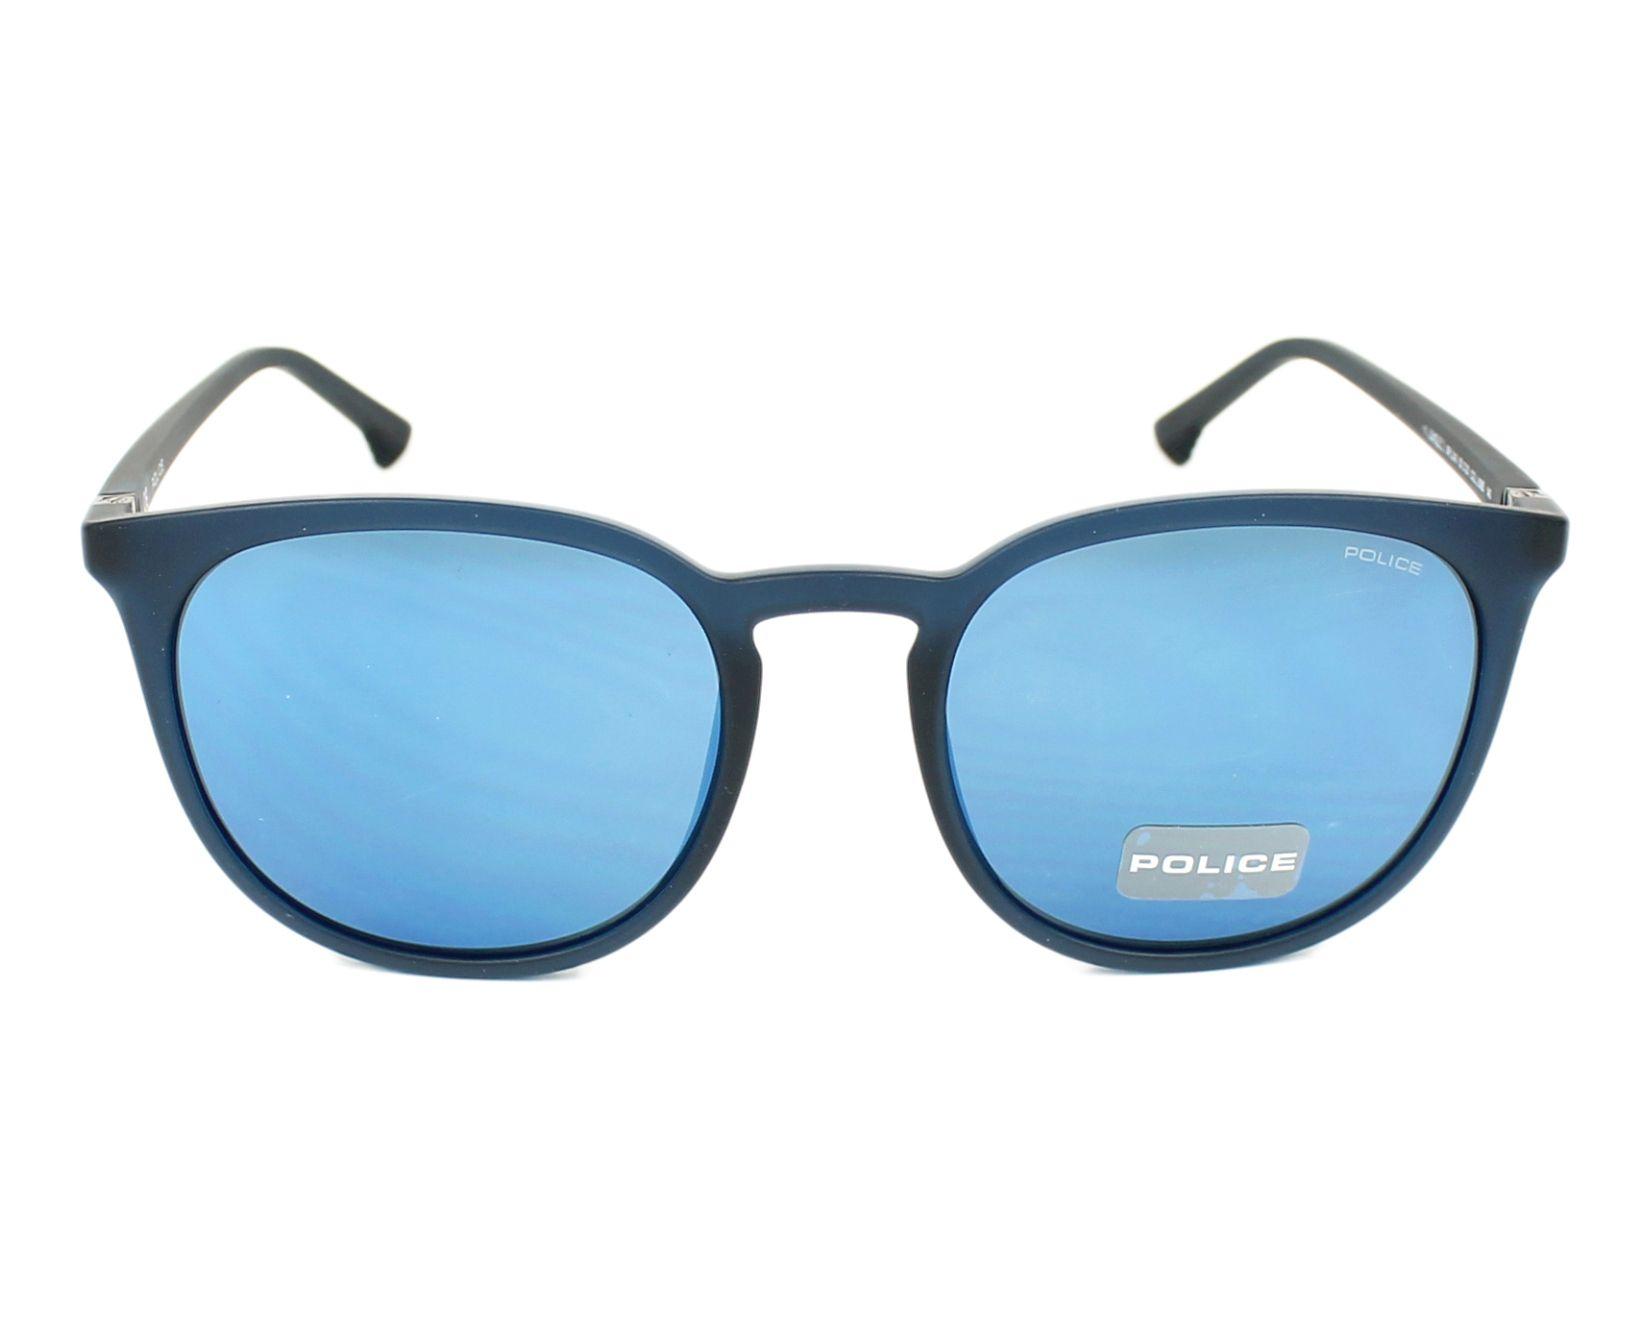 thumbnail Sunglasses Police SPL-343 U58B - Blue Blue front view cfefba0b94